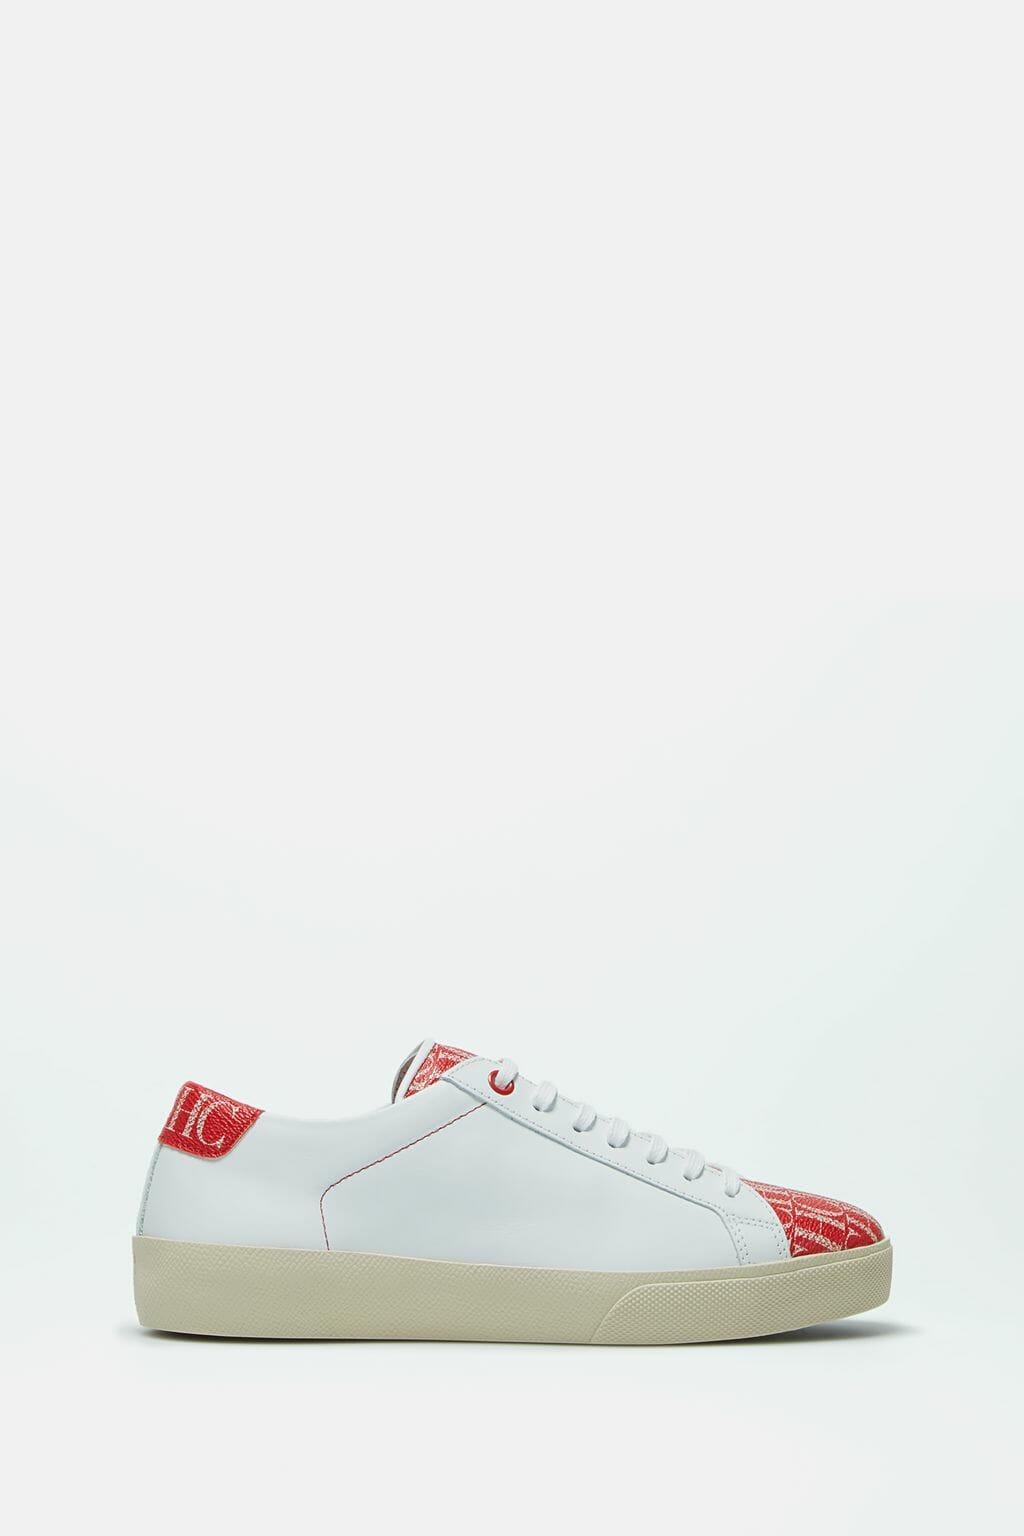 CH-Carolina-herrera-shoes-collection-Spring-Summer-2018-shoe-77